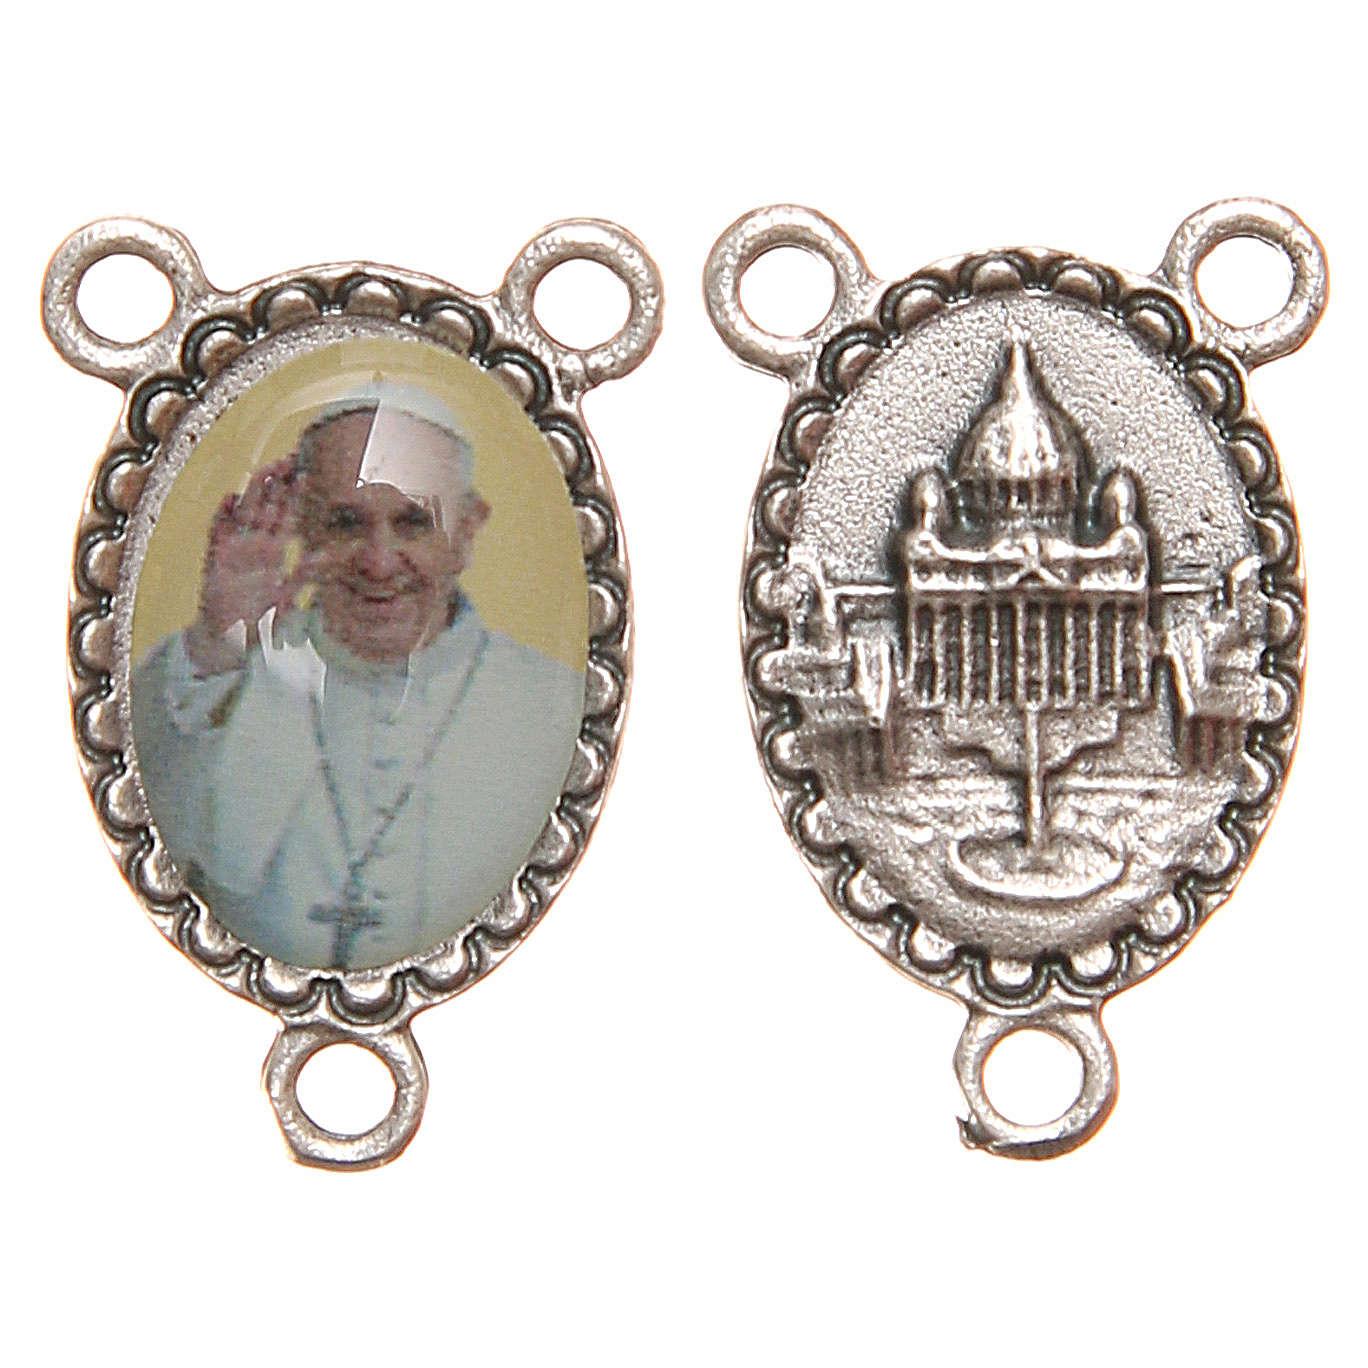 Crociera Papa Francesco metallo ovale resina cm 1,8 4